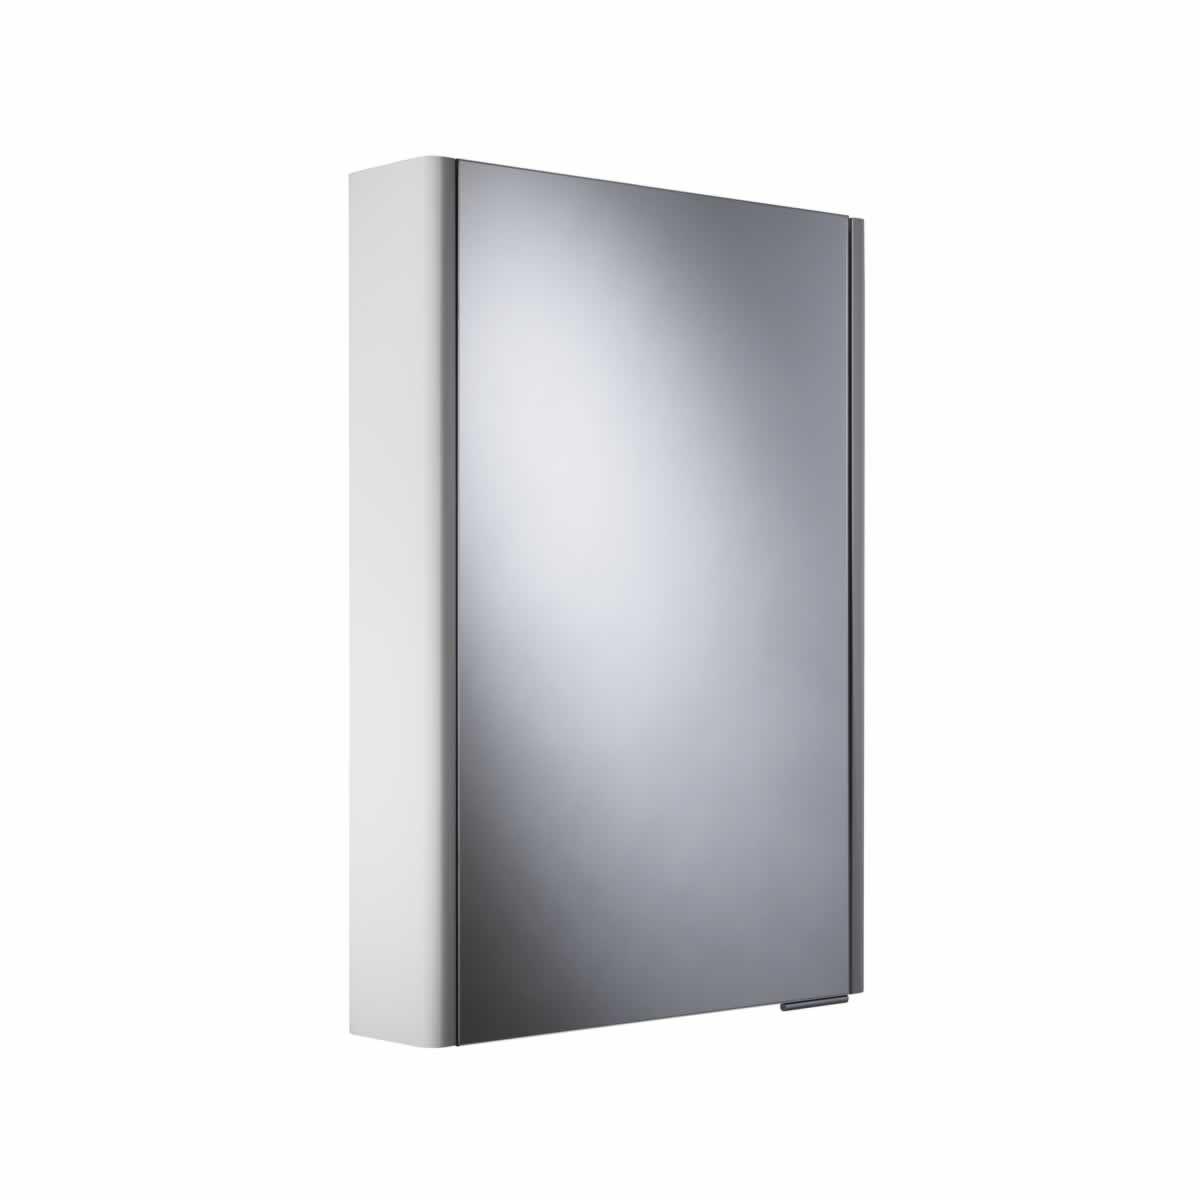 roper rhodes phase mirror cabinet uk bathrooms